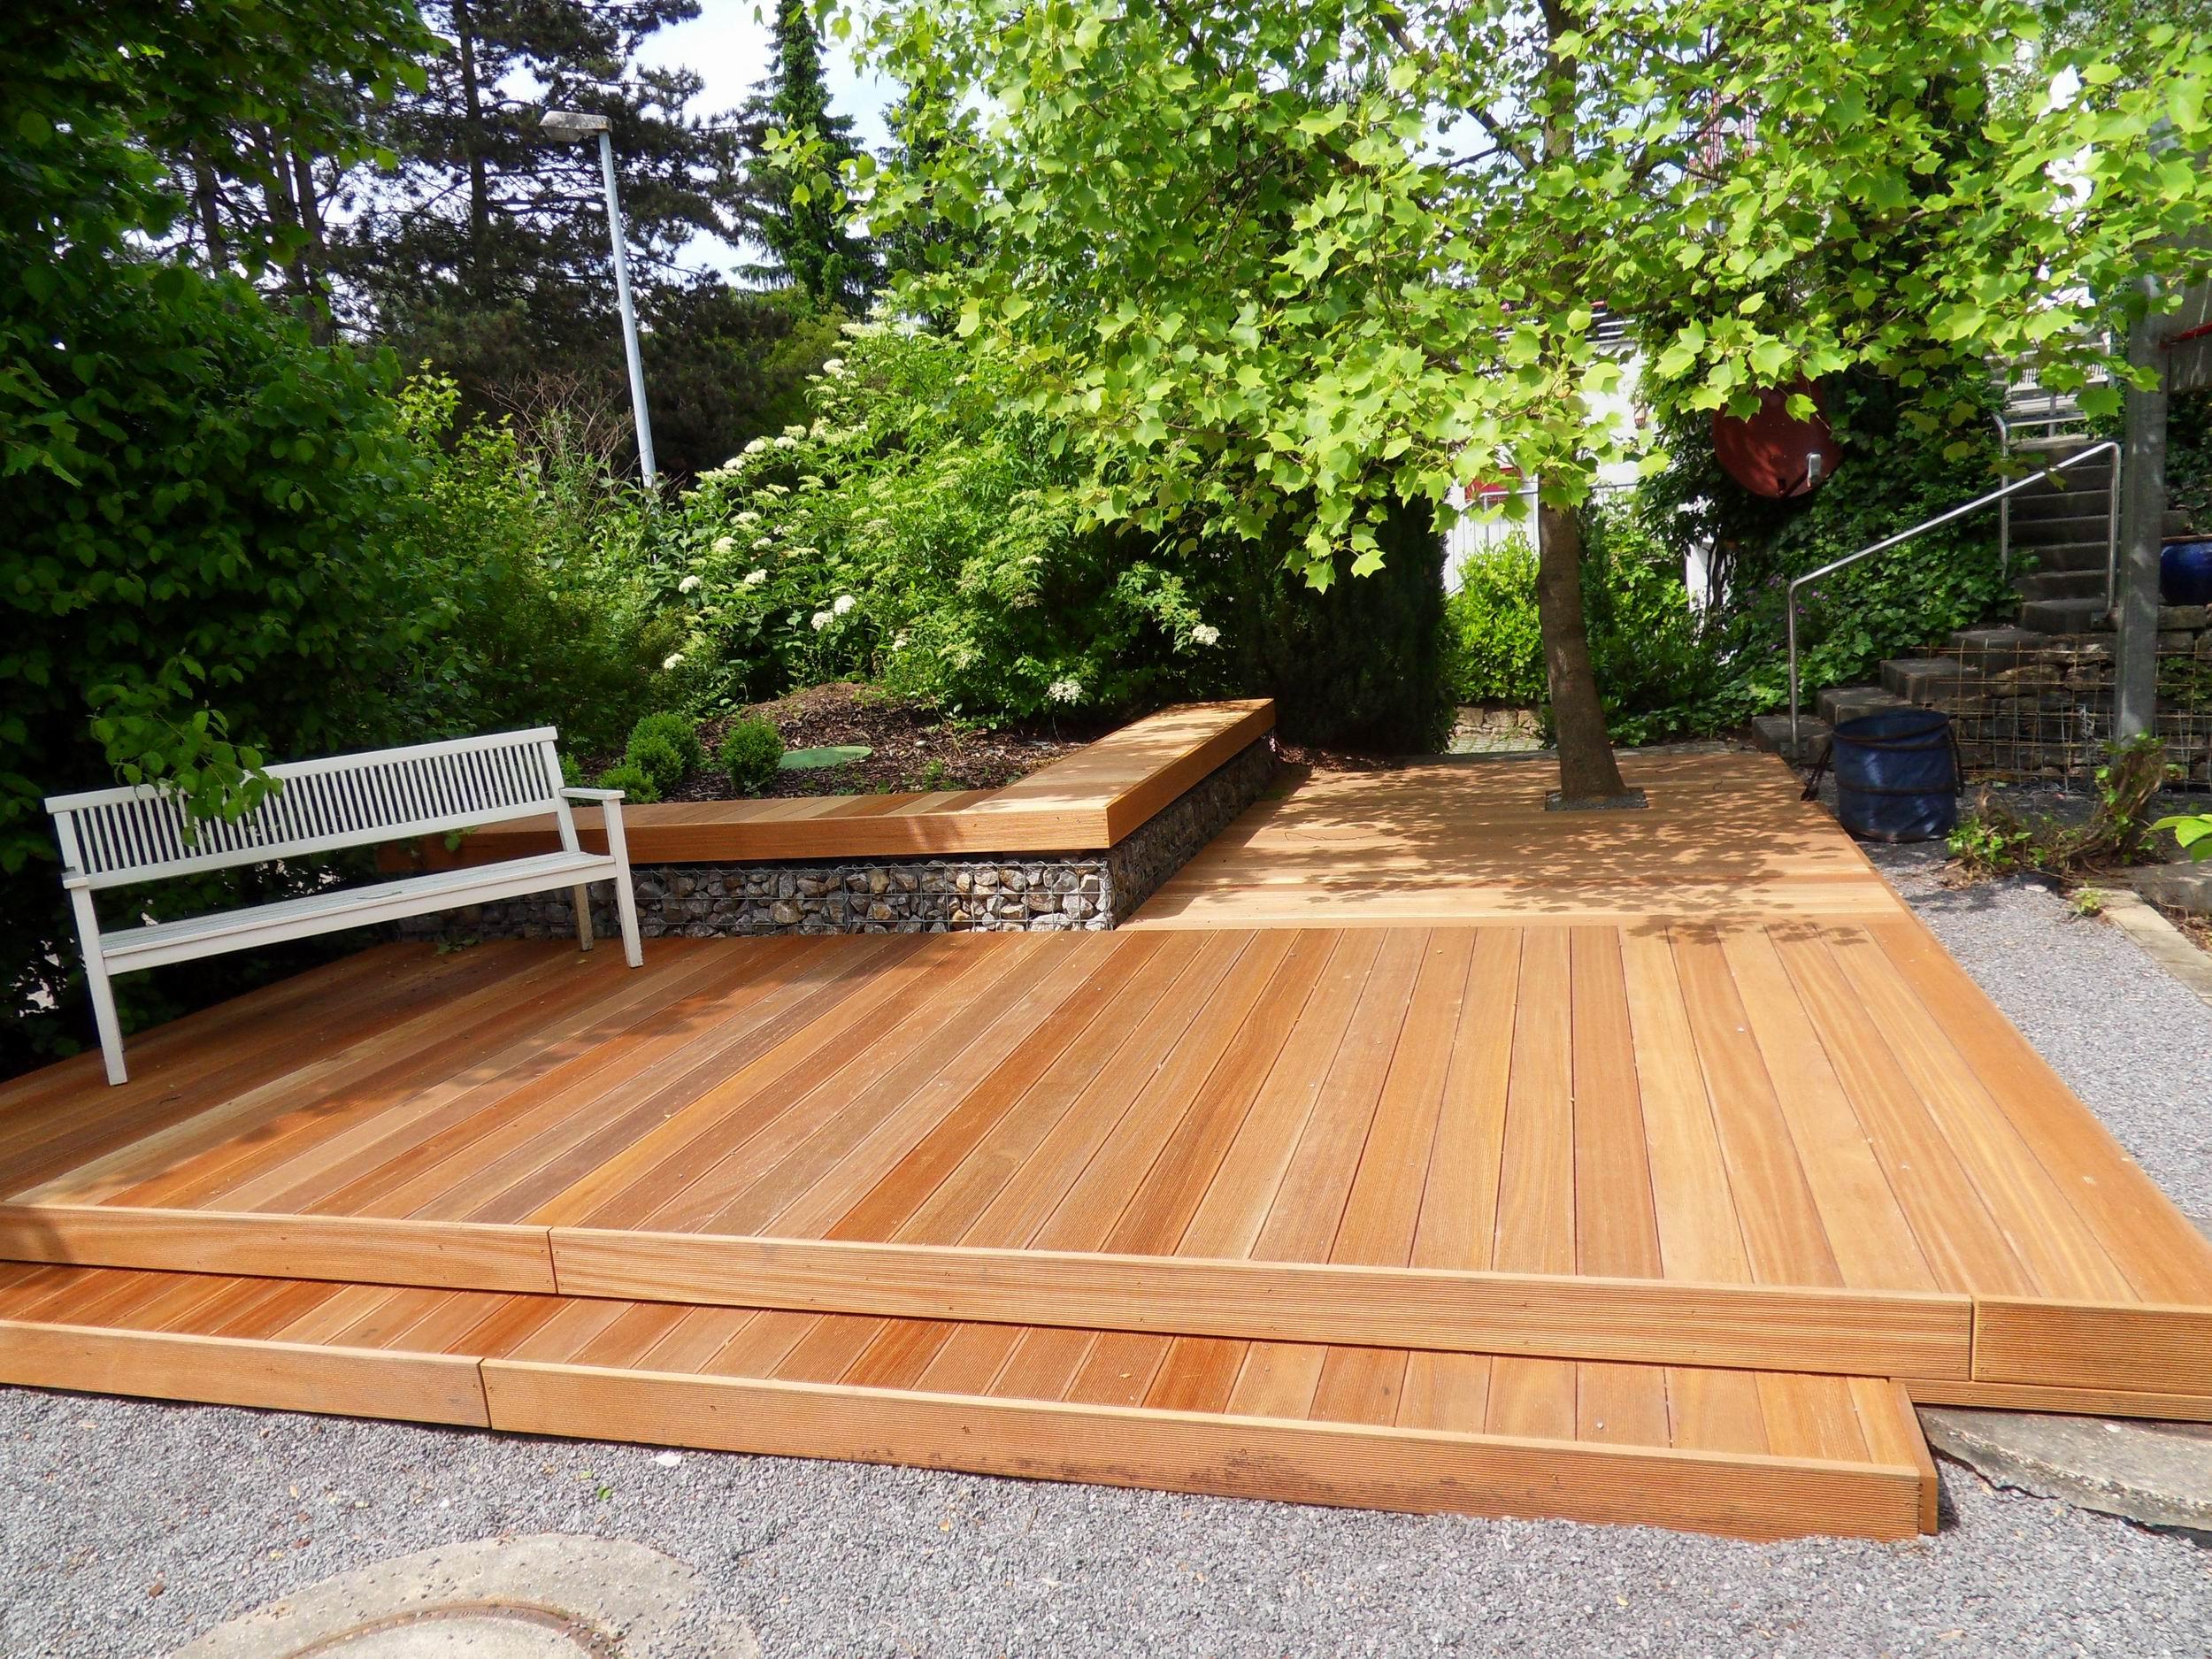 Terrasse Holz Lasur Entfernen – Bvrao